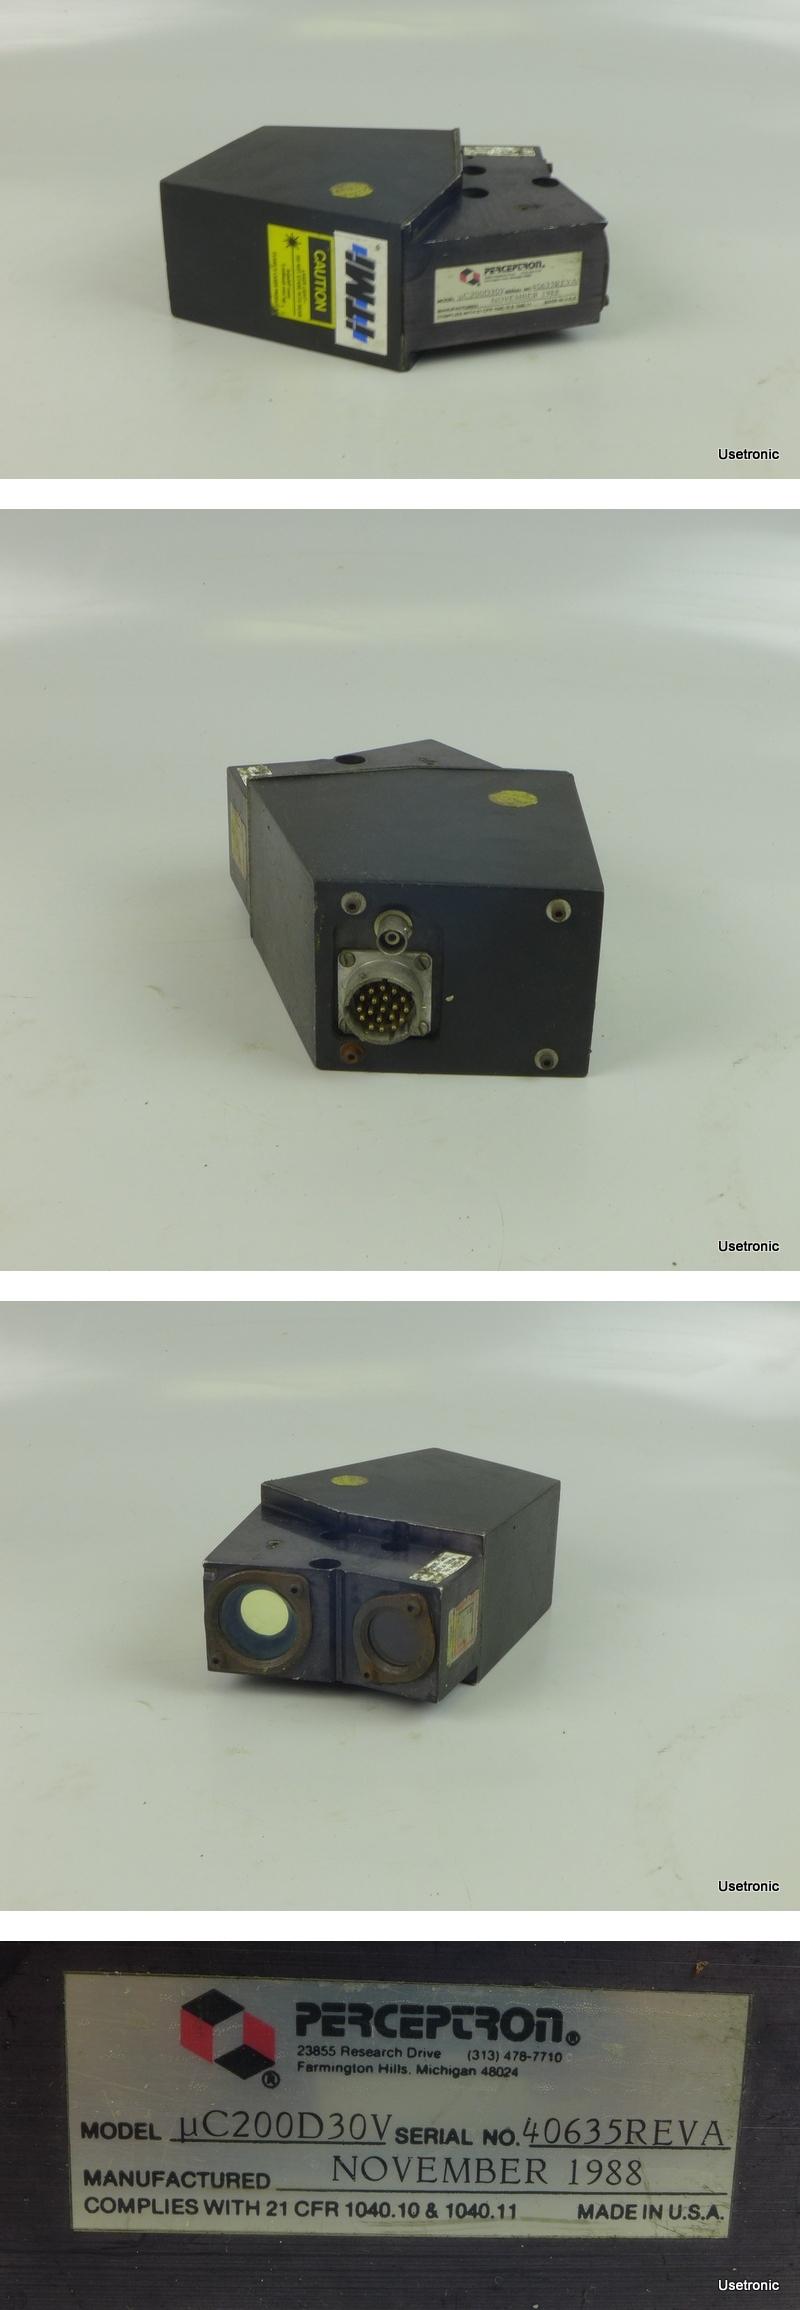 Perceptron µC200D30V